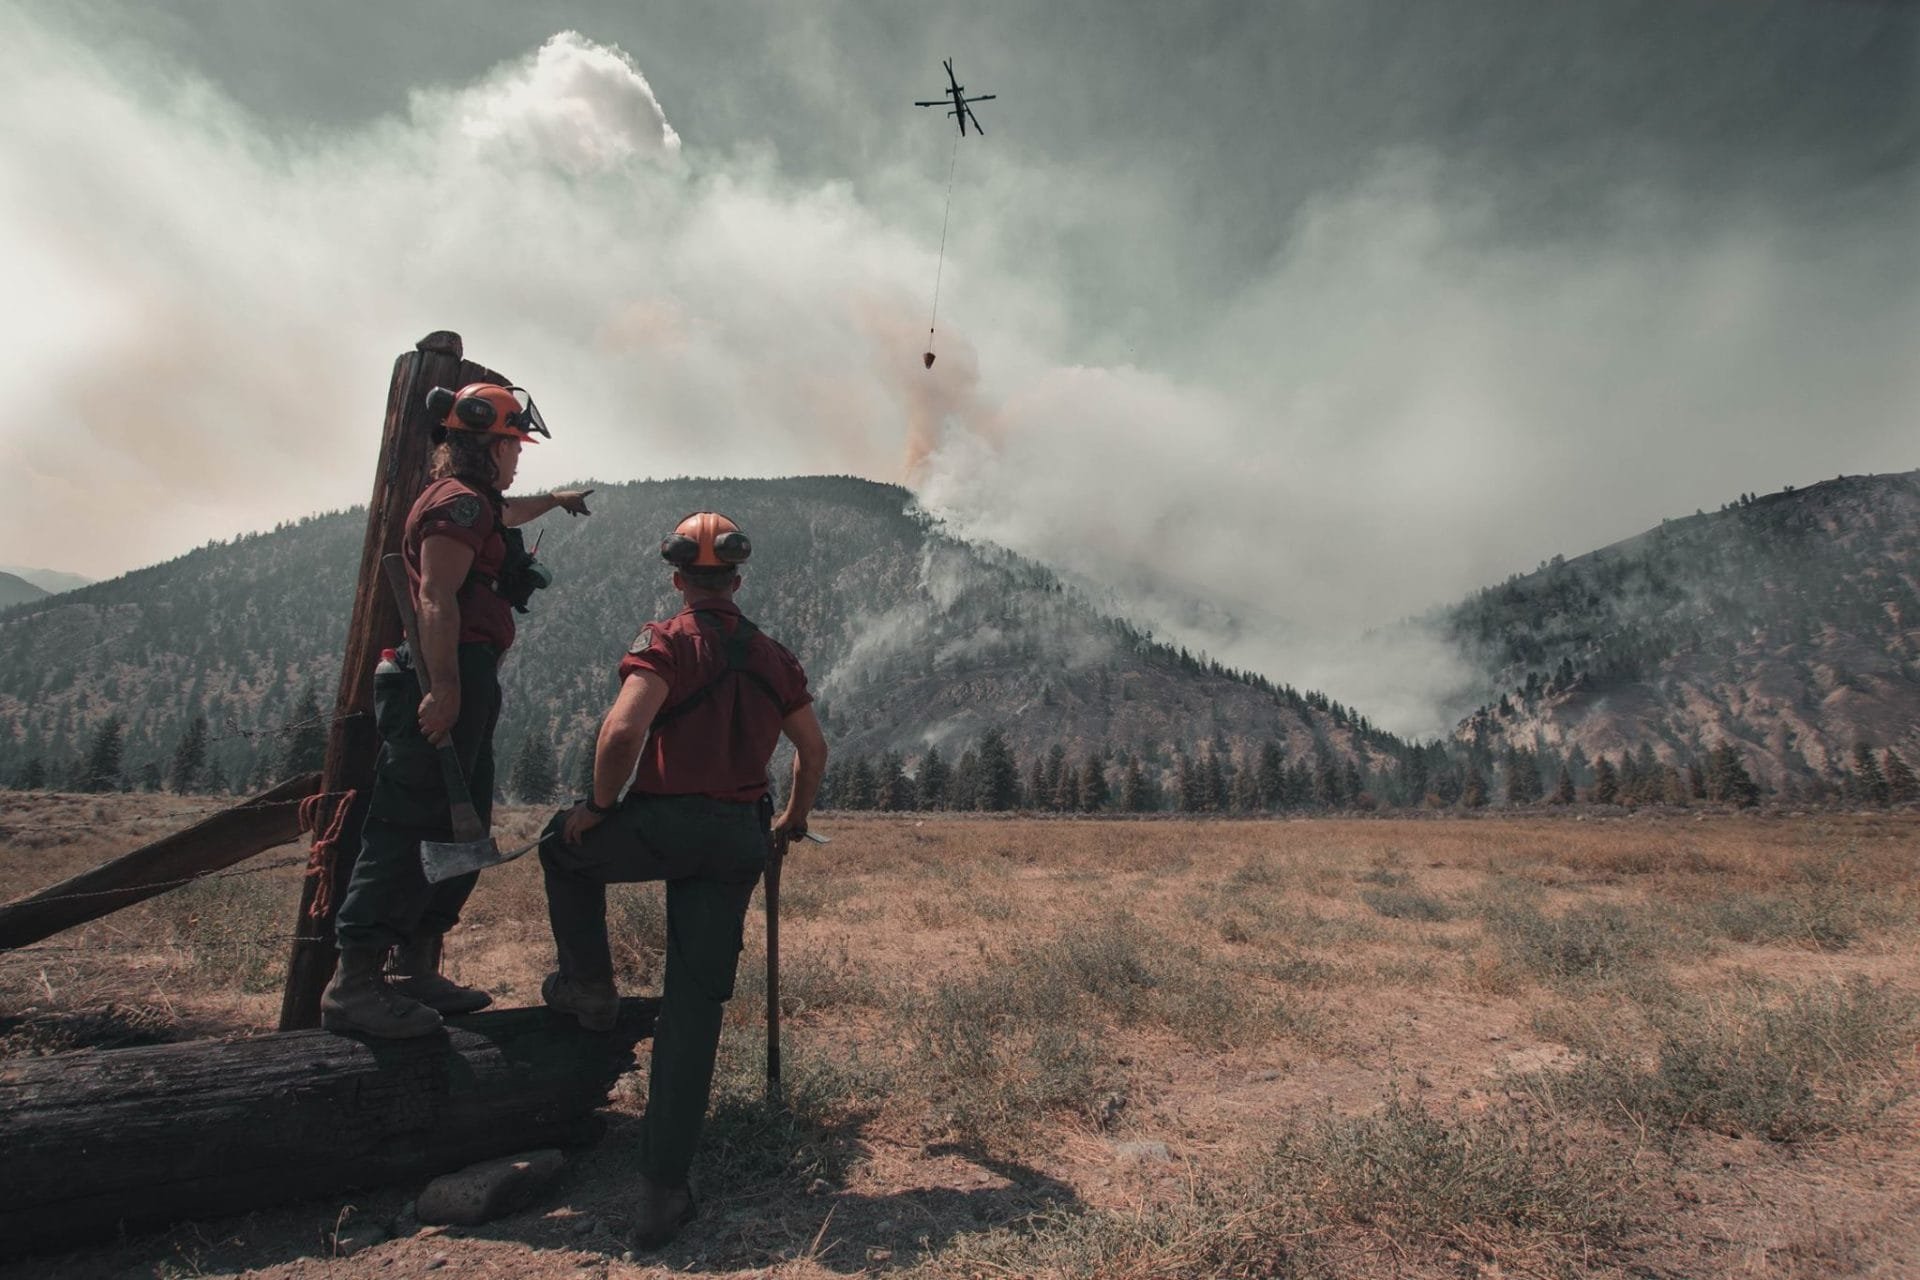 B.C. Wildfire Service